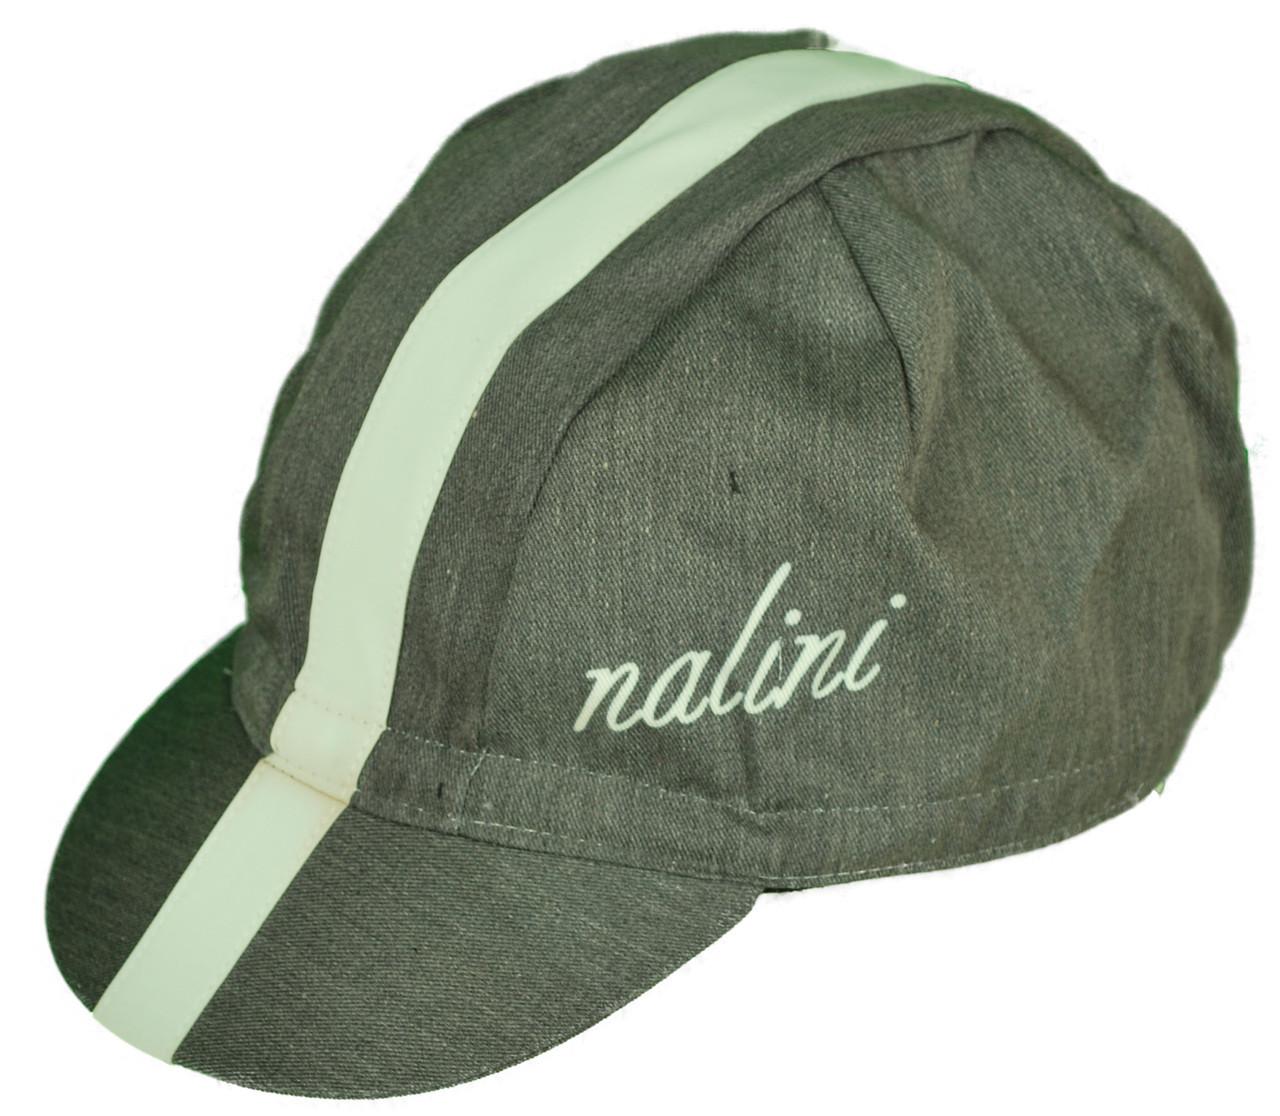 Nalini Settana Retro White Cap